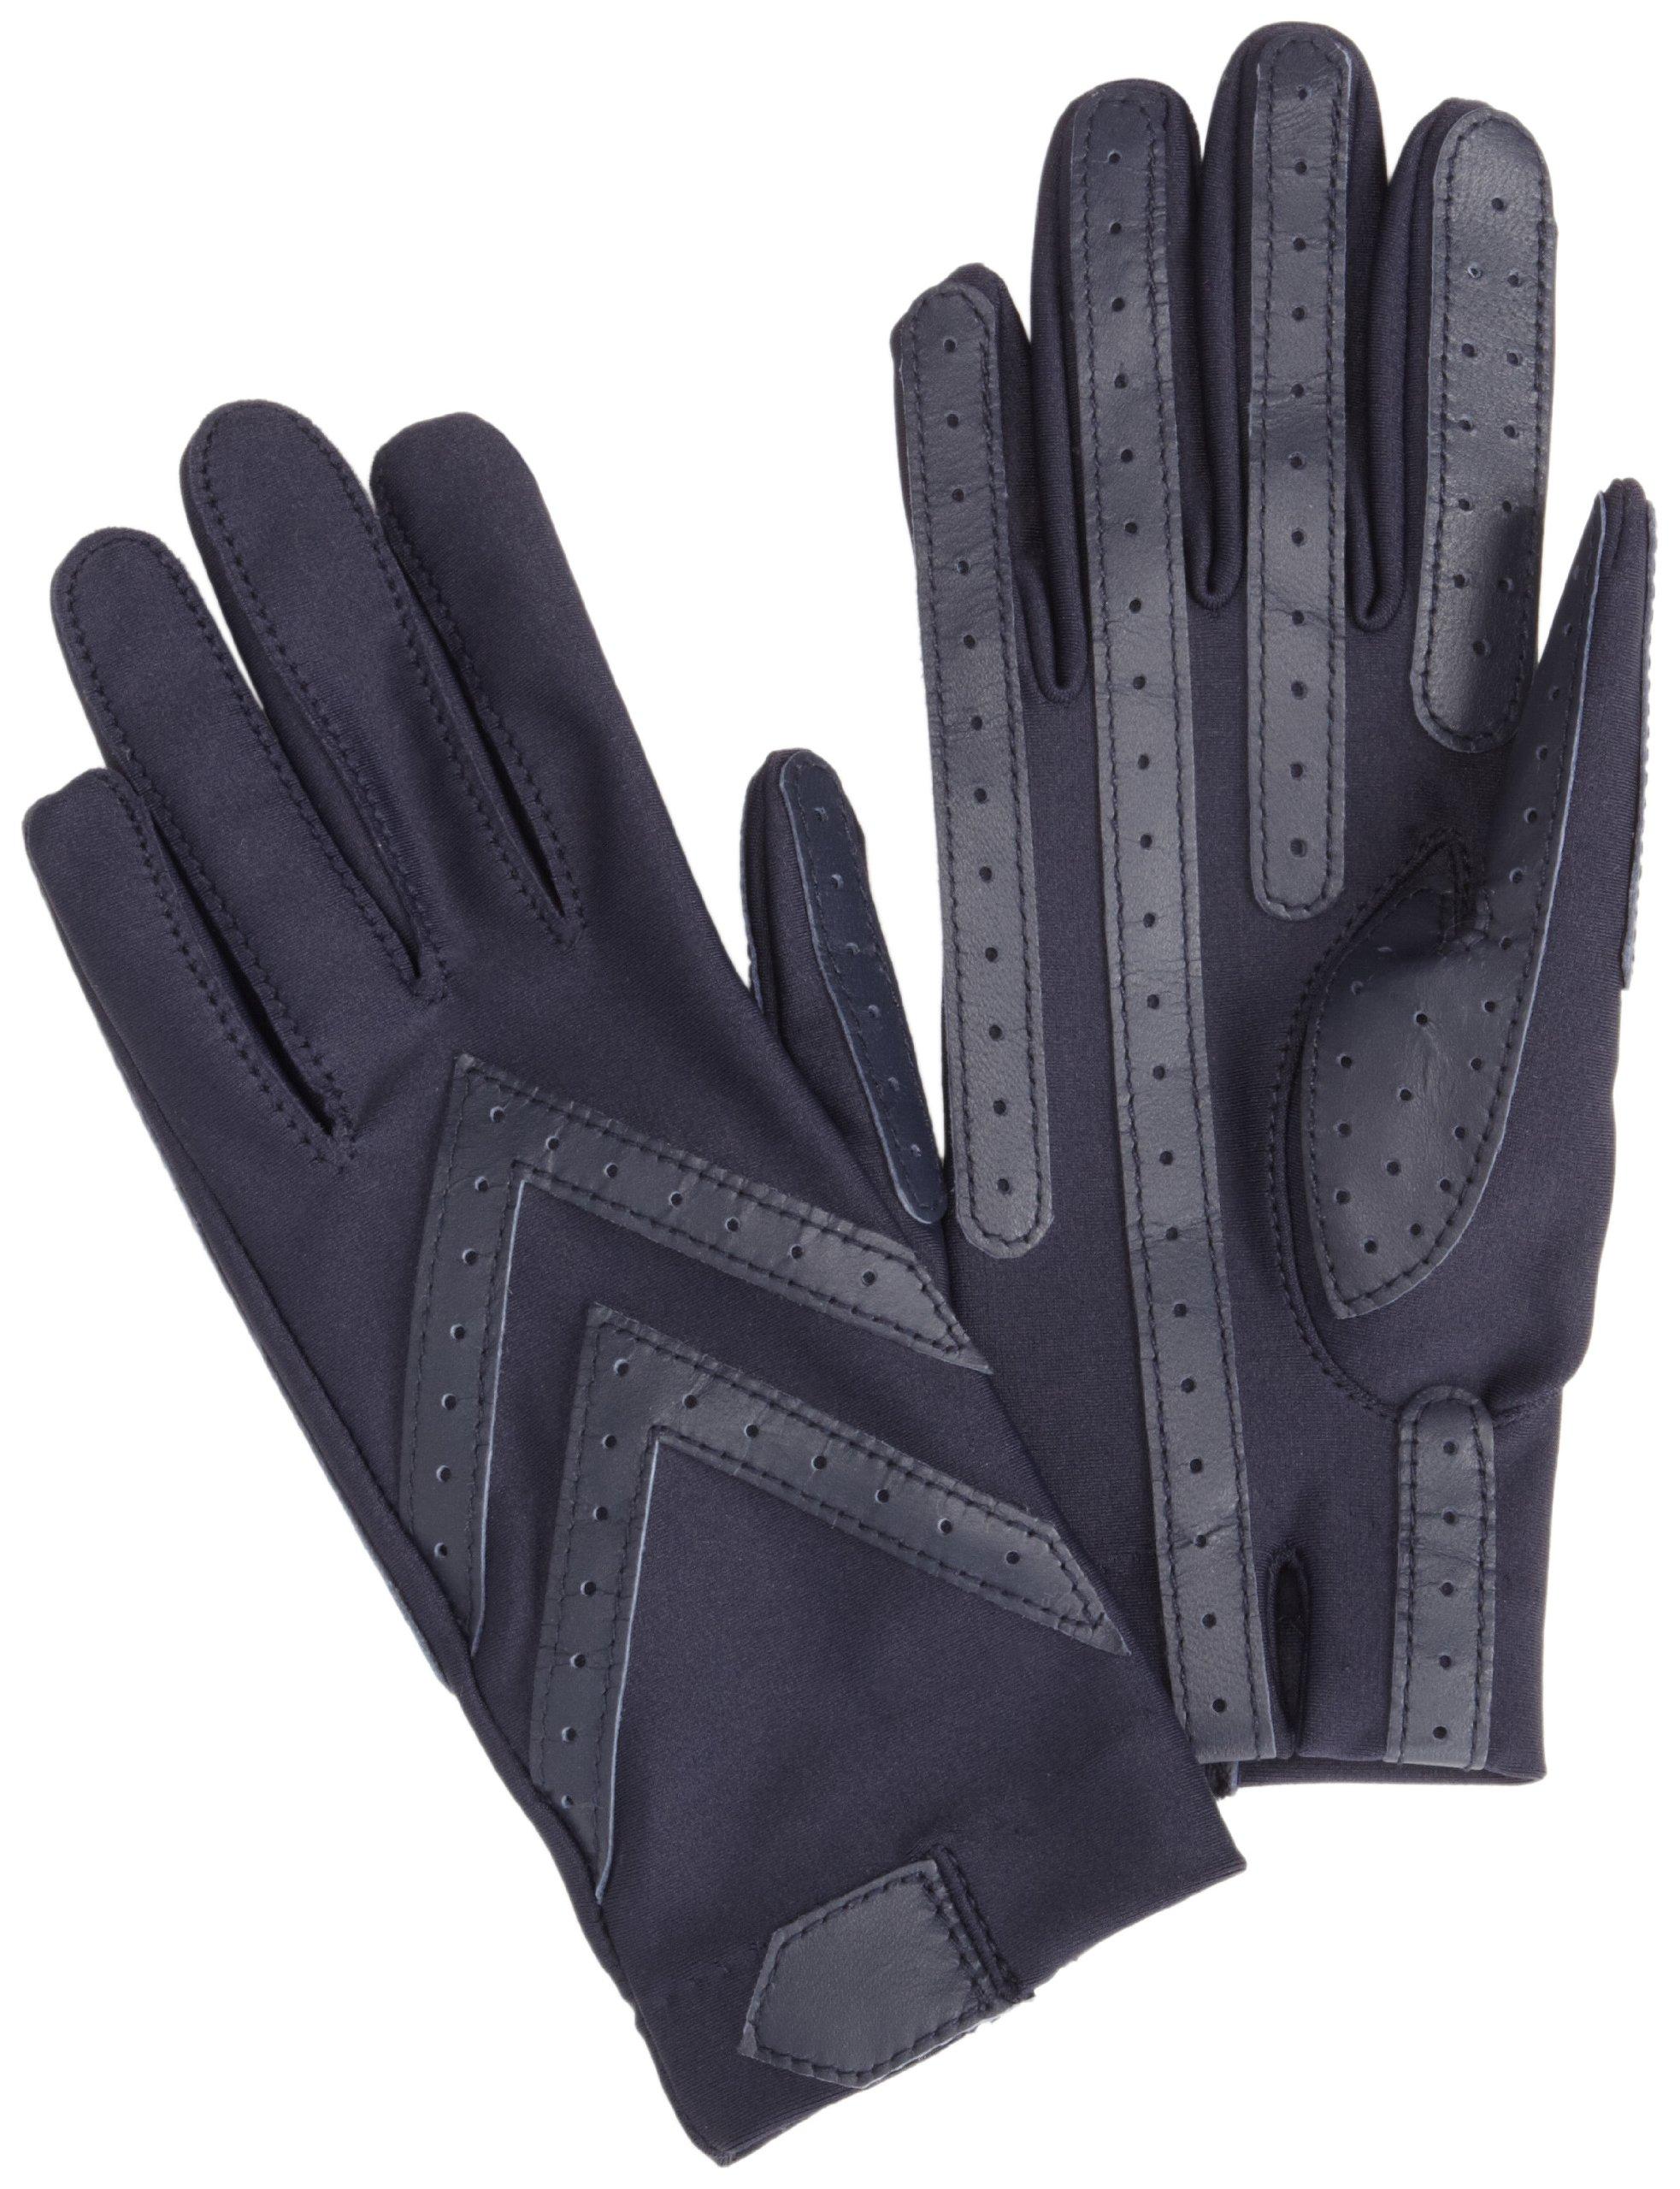 Isotoner Women's Spandex Shortie Unlined Glove,Navy,One Size